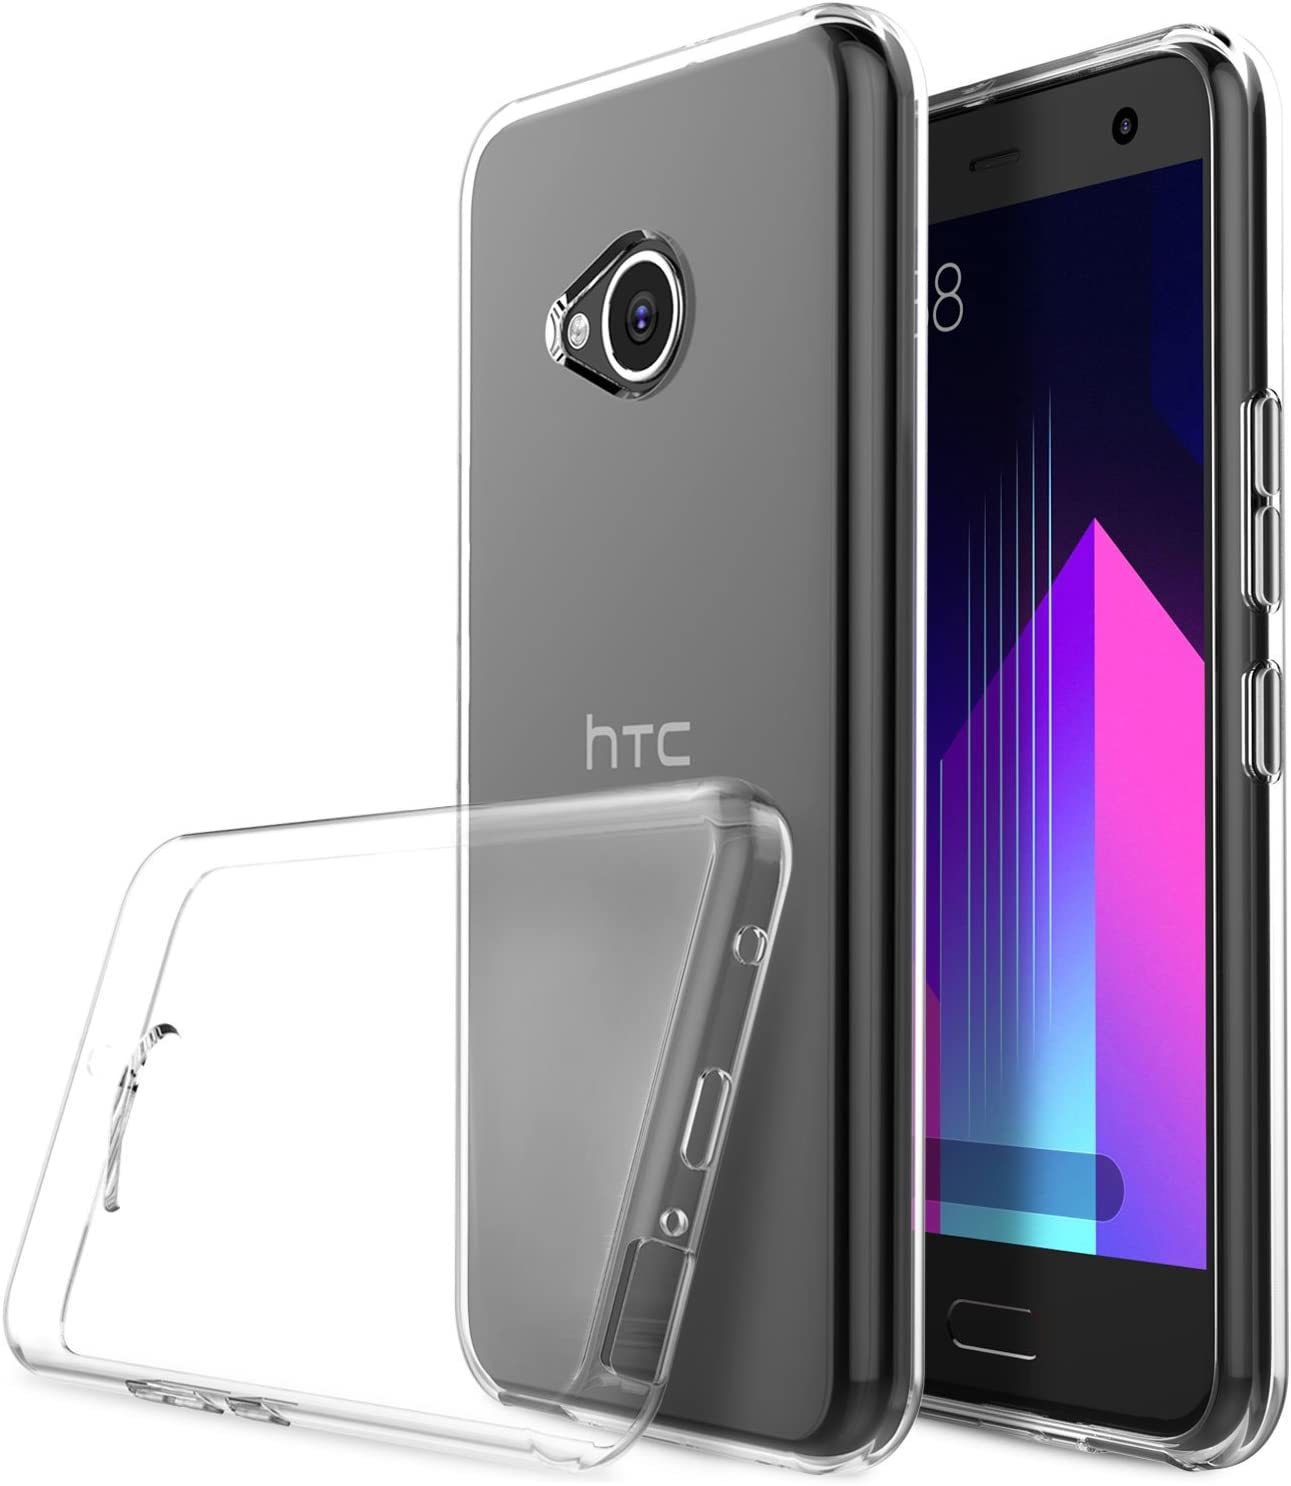 Funda HTC U11 Life, KuGi TPU Transparente Slim Silicona Case Cover ...